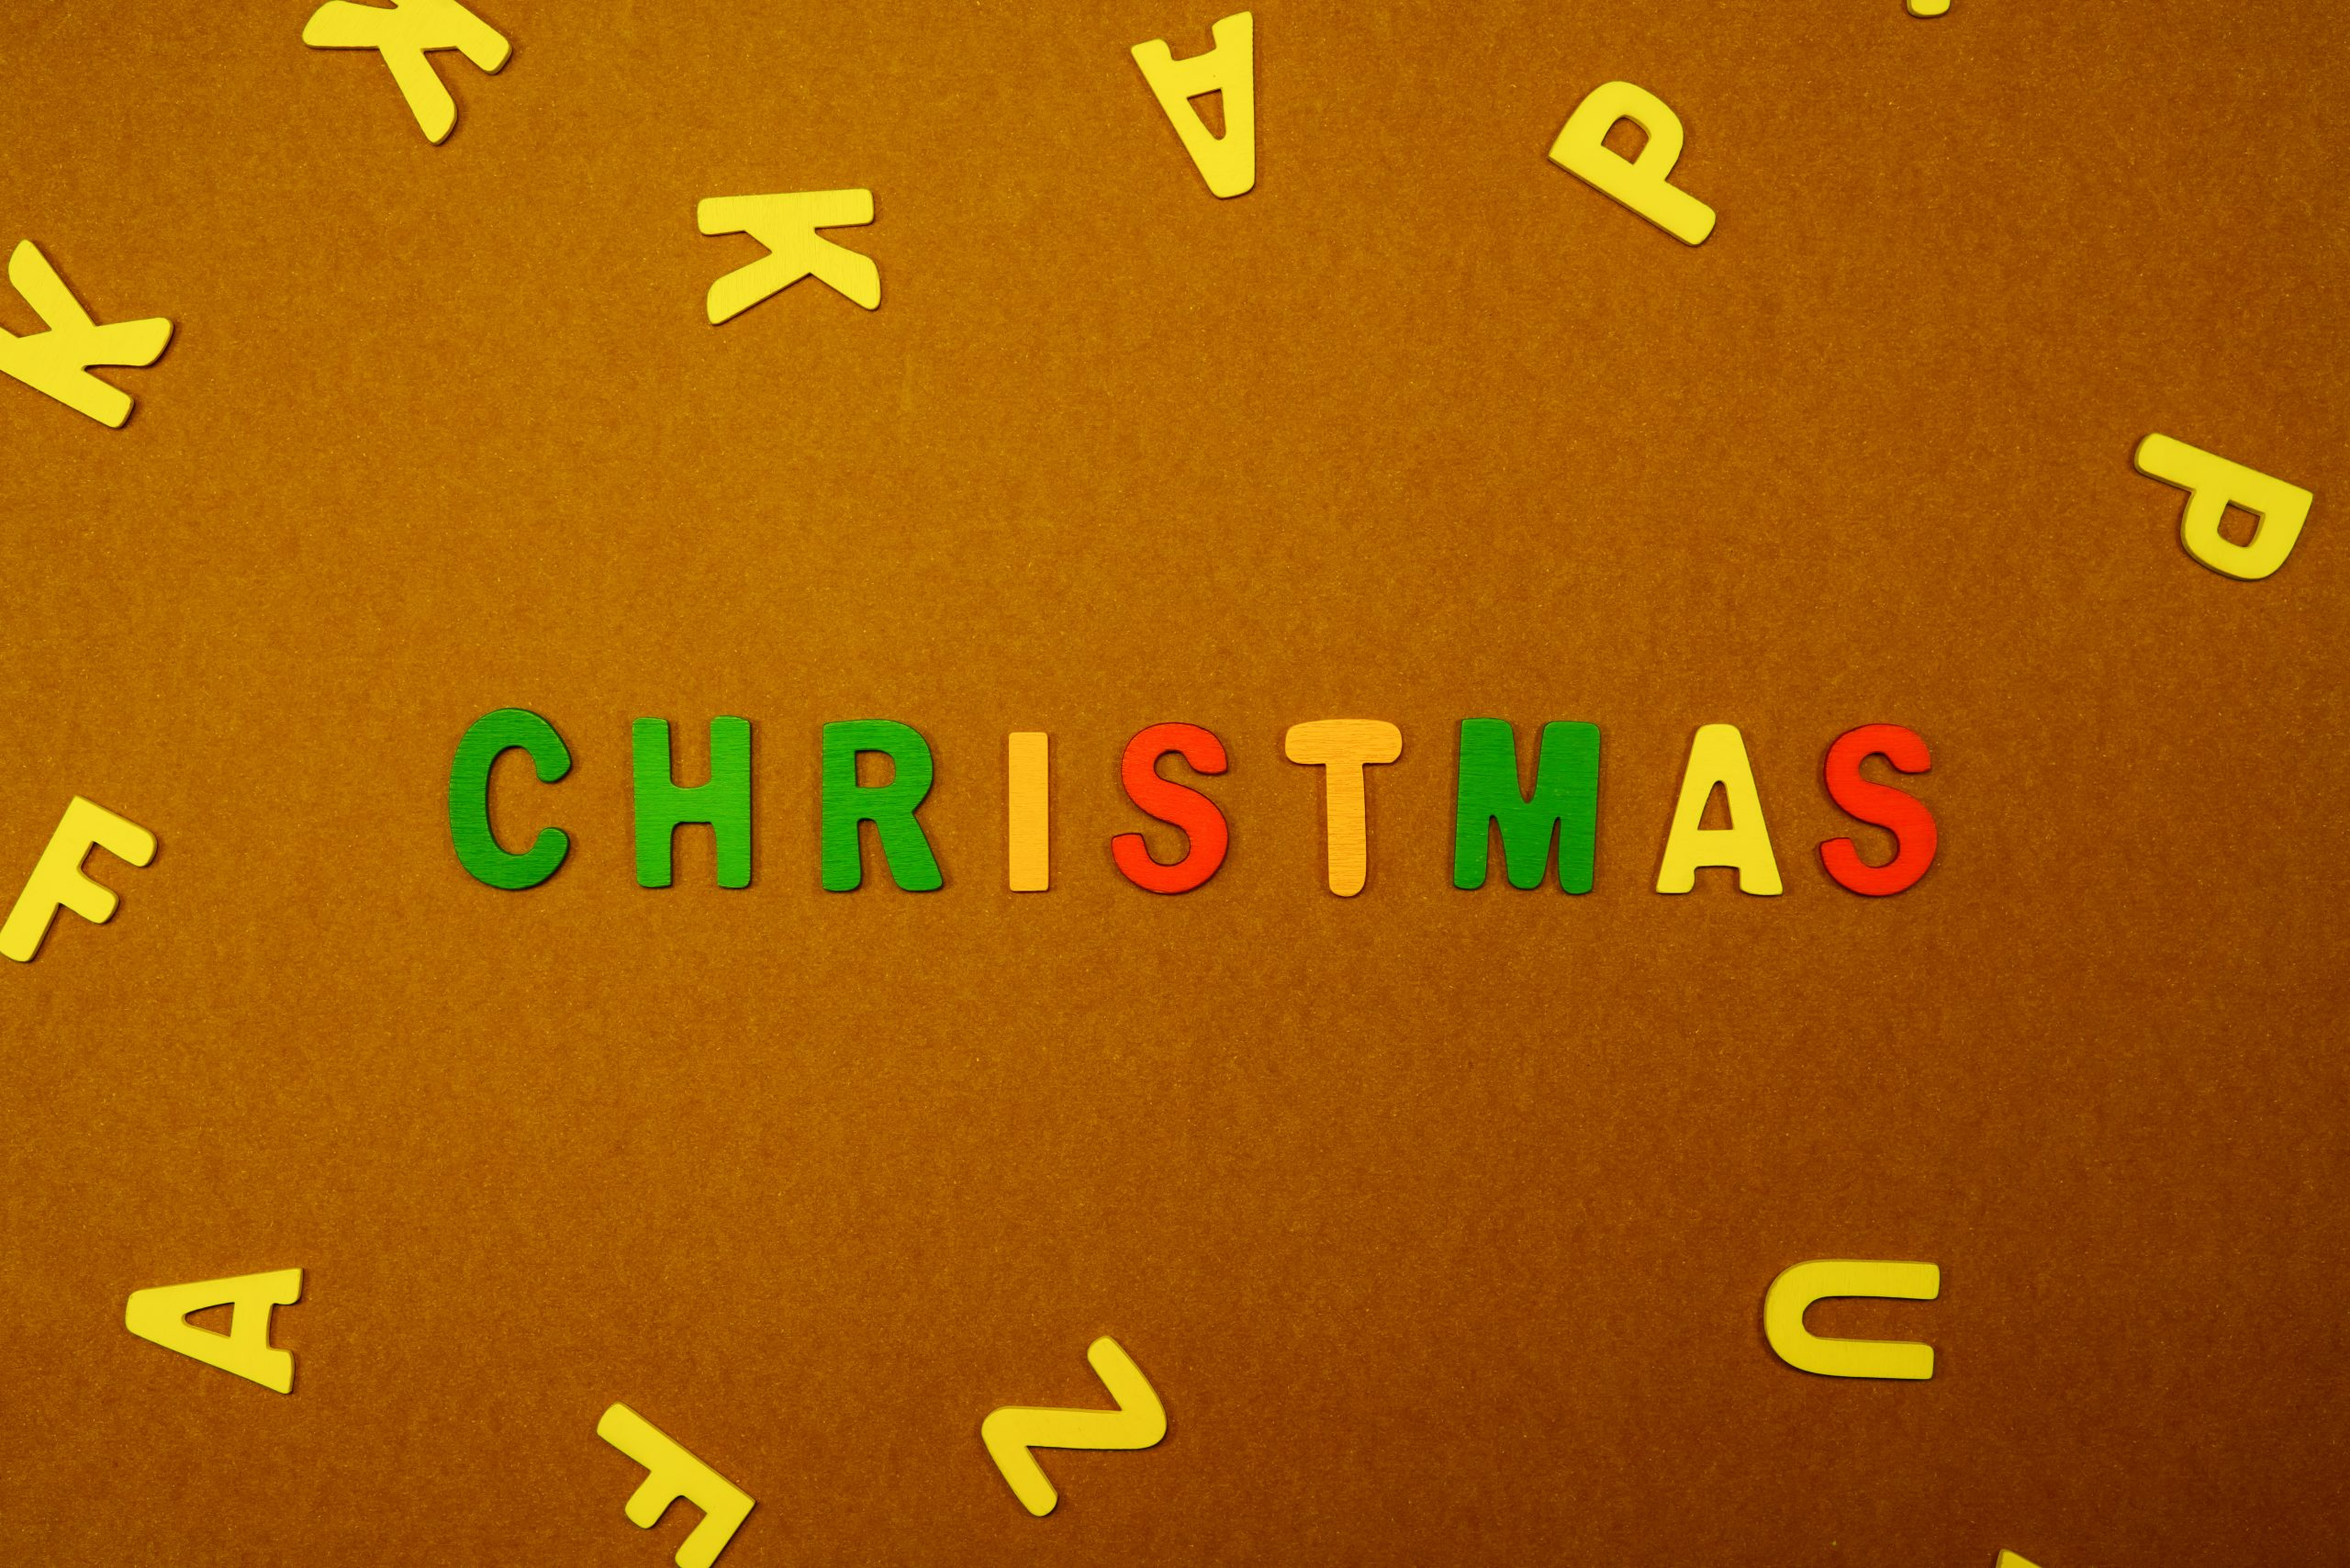 Christmas written on scrabble